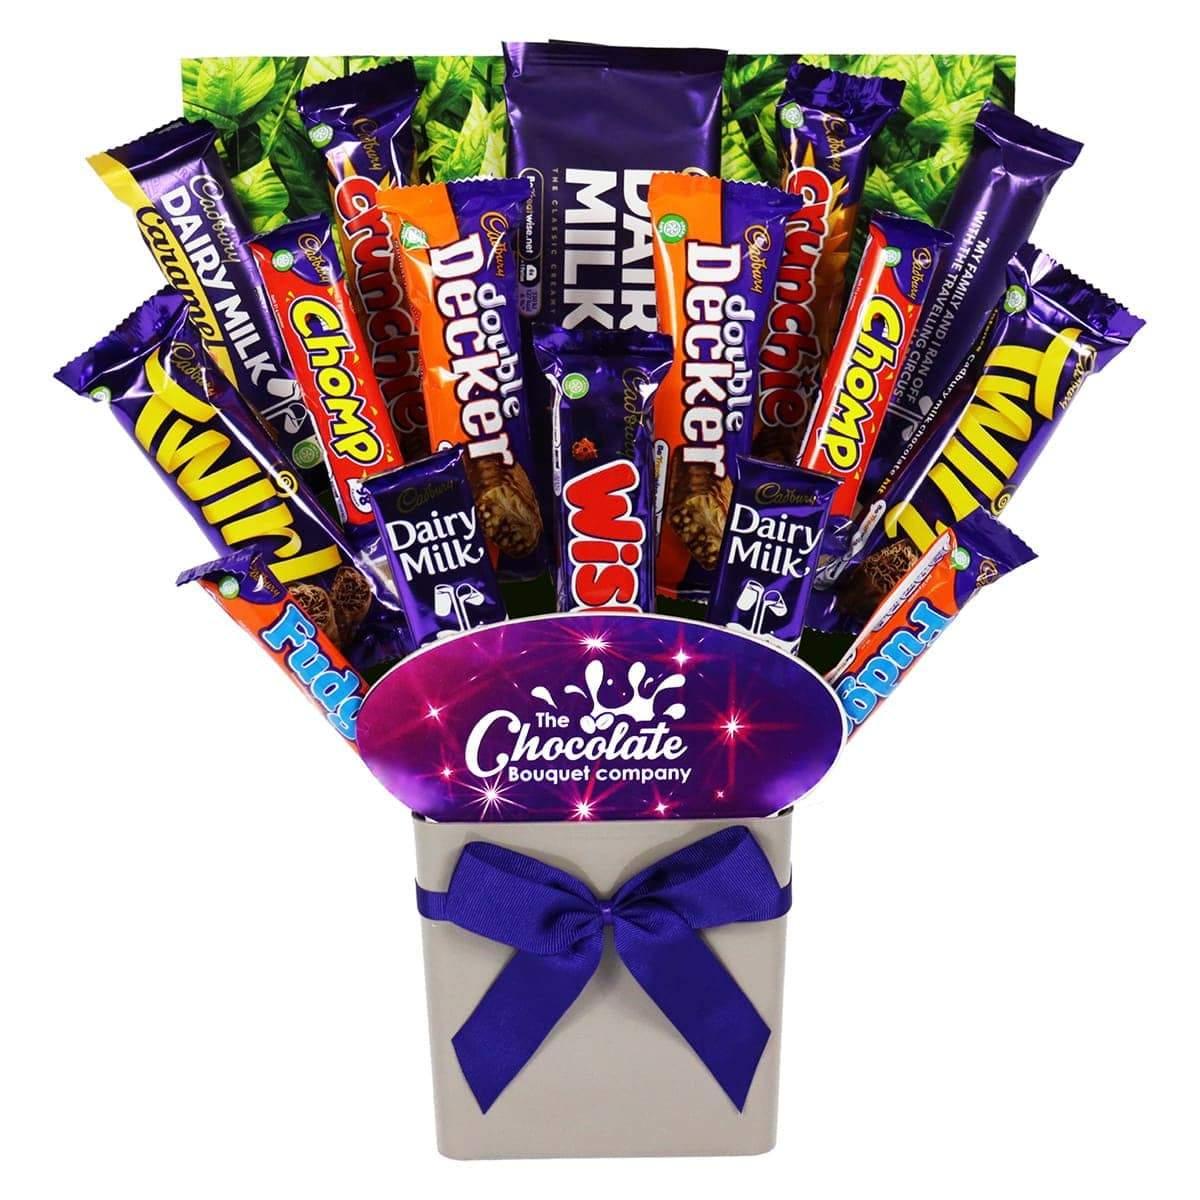 The 'Cadbury Variety' Chocolate Bouquet